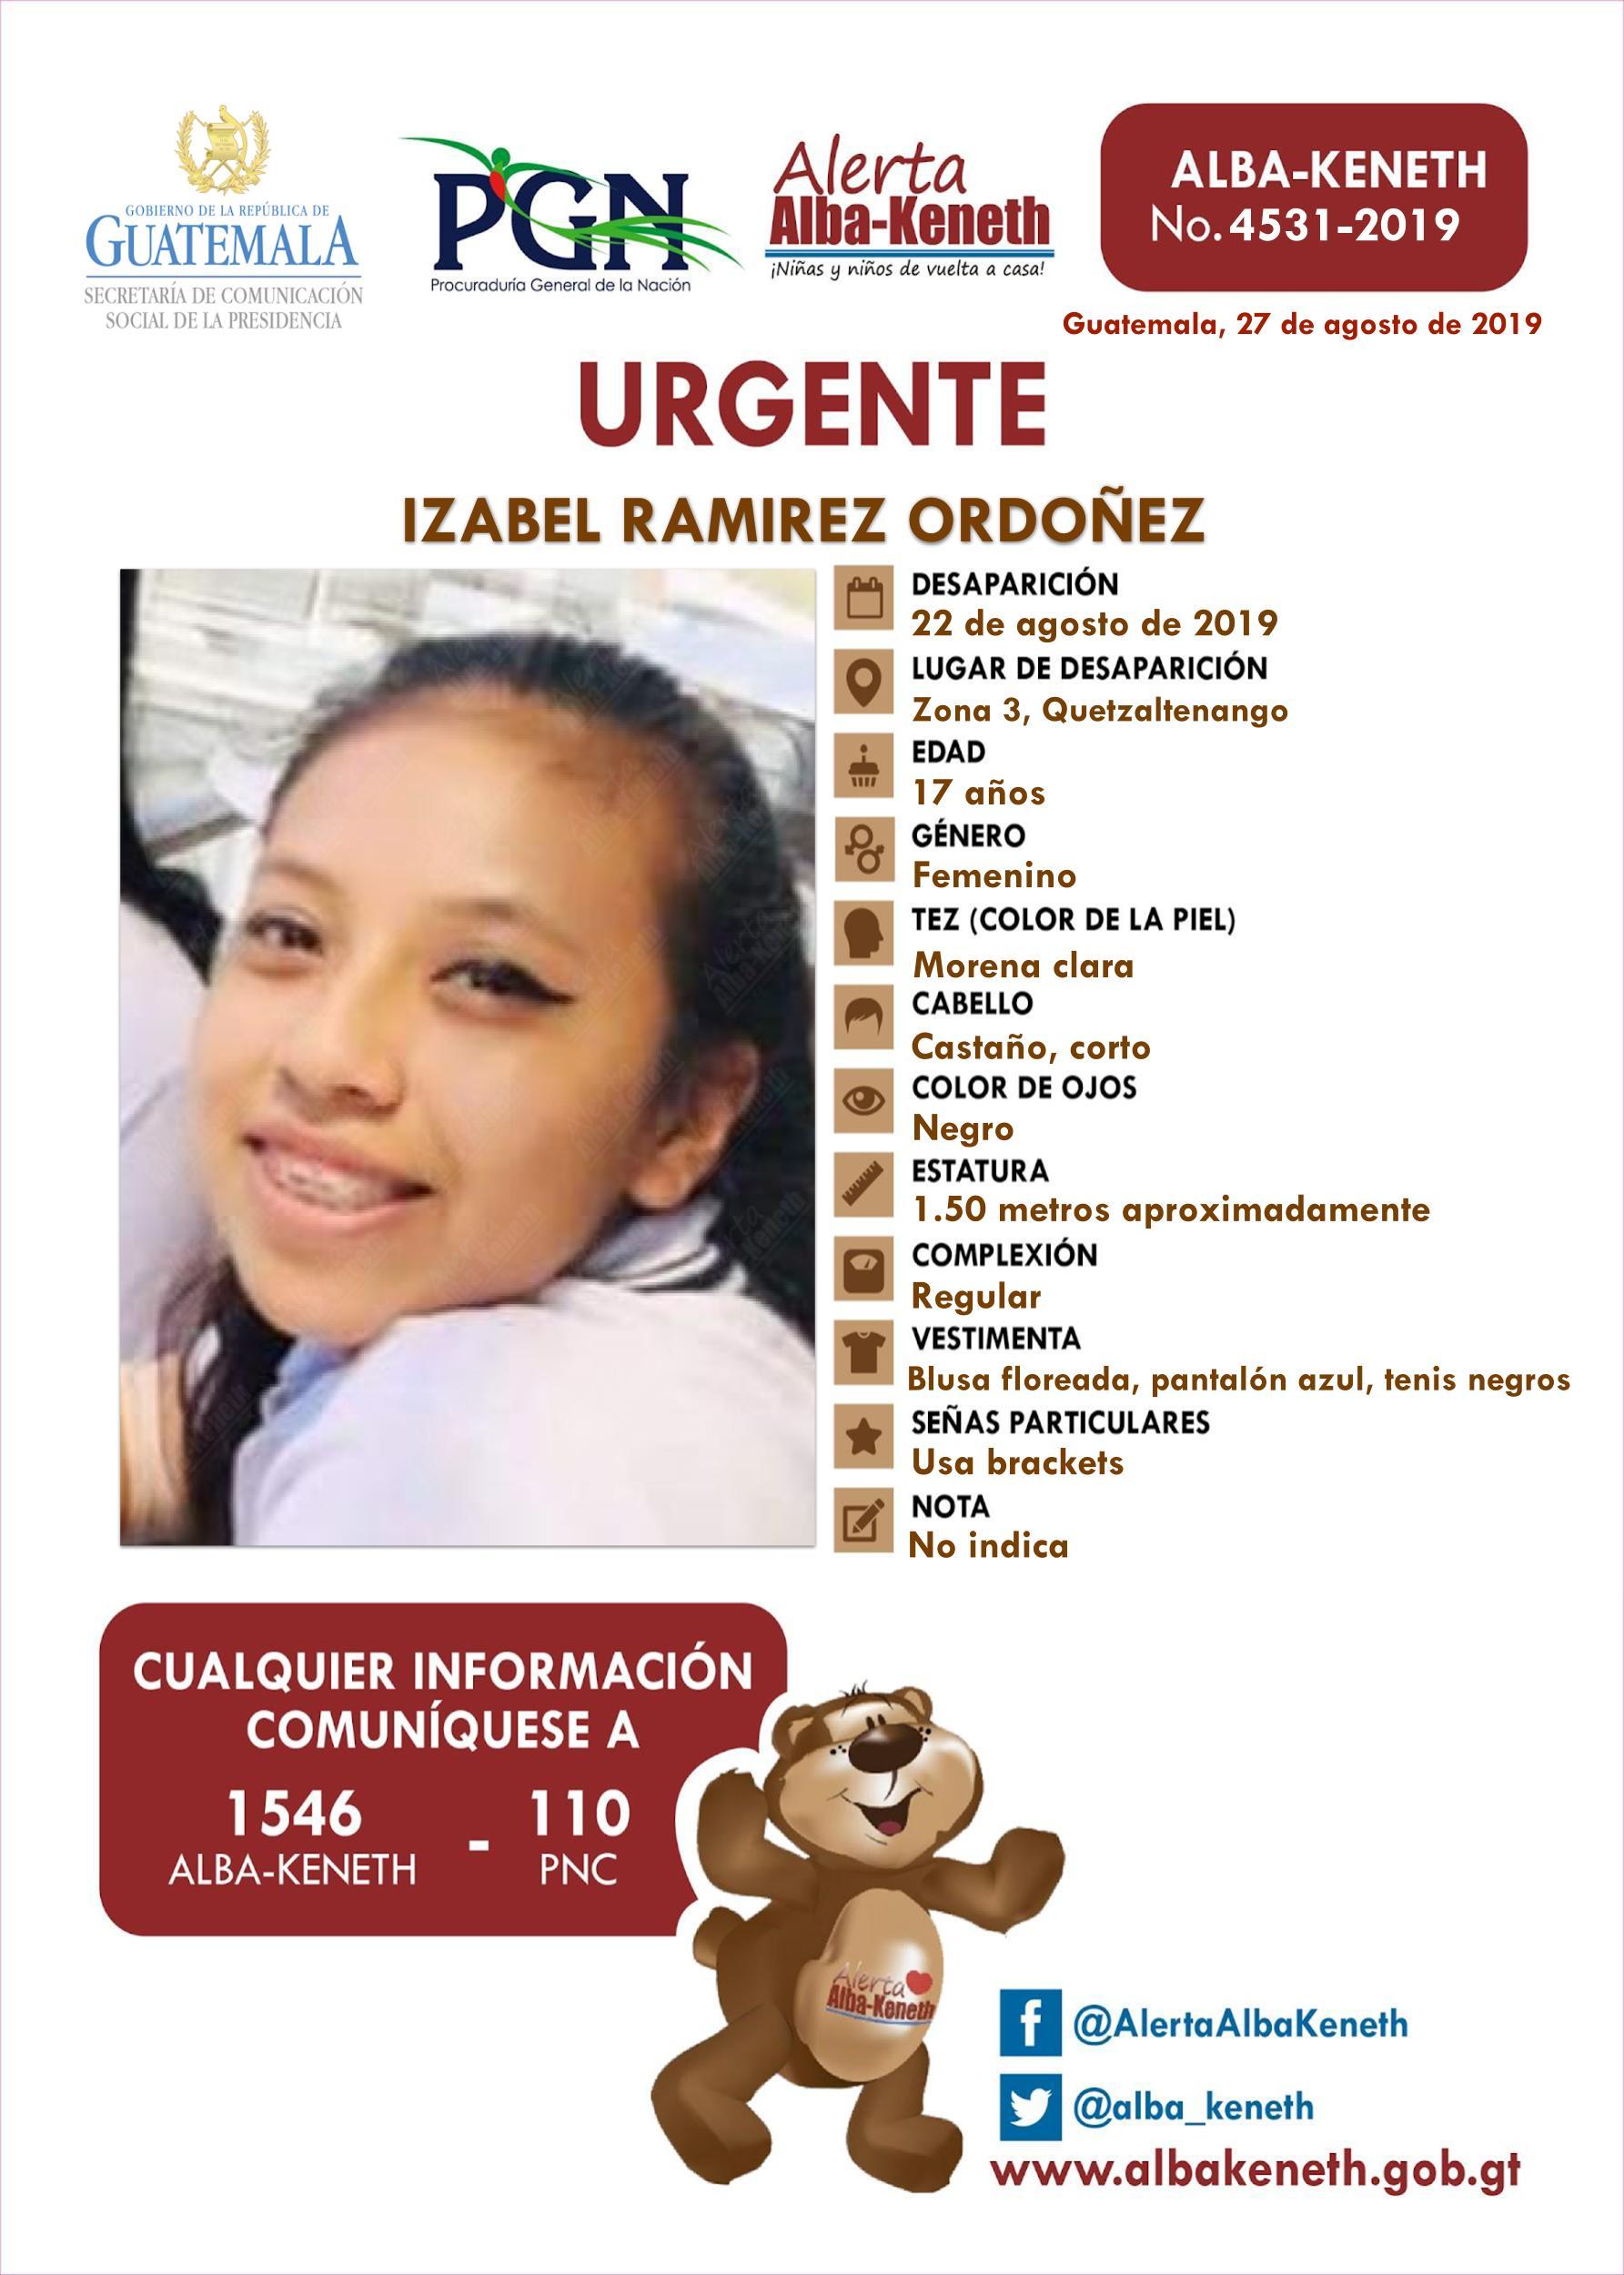 Izabel Ramirez Ordoñez